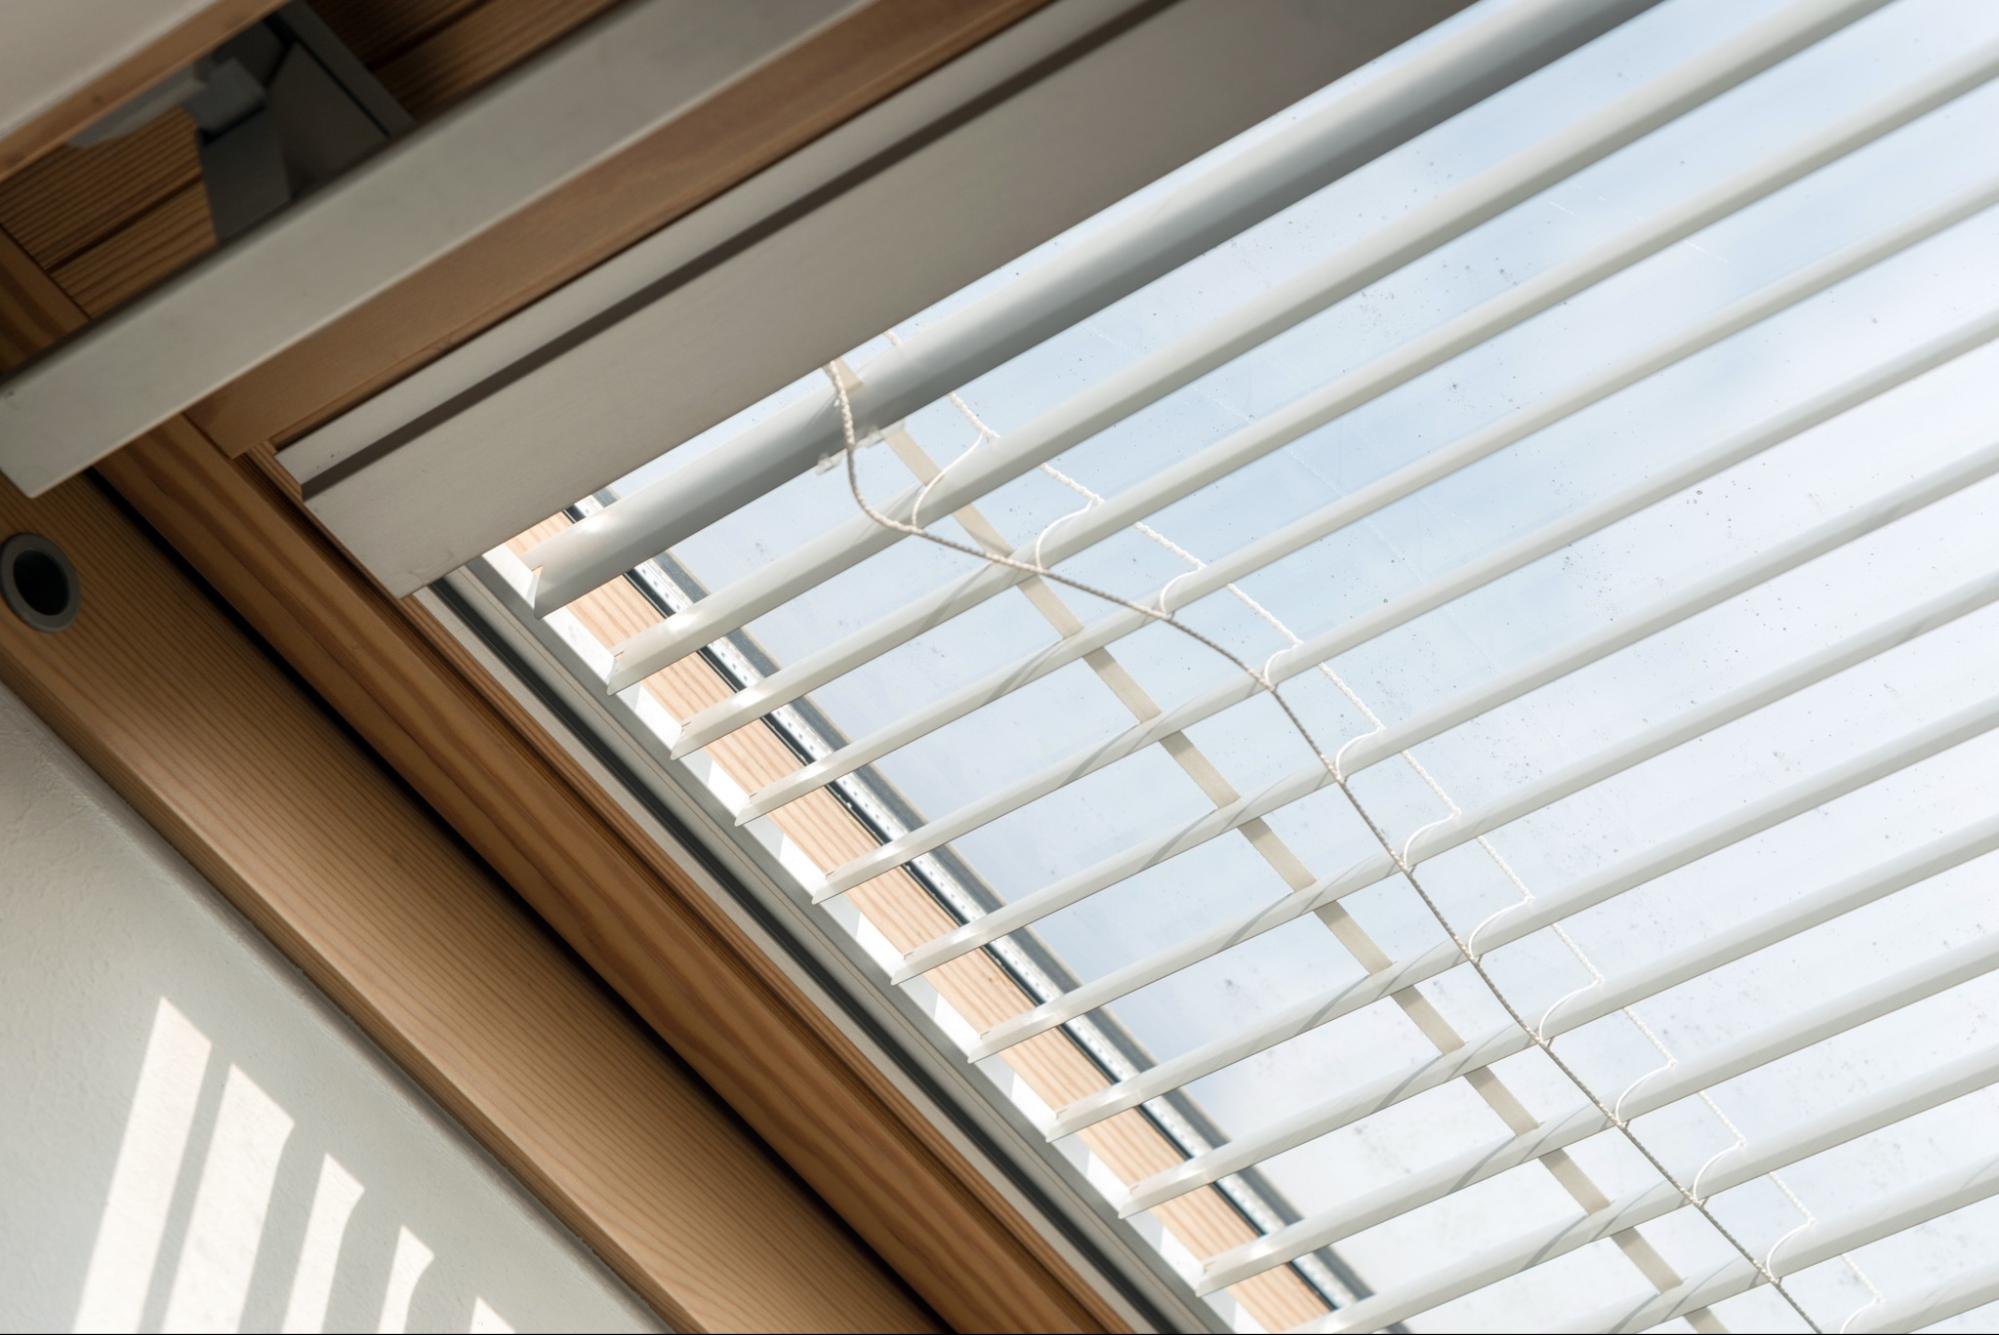 fitting Velux skylight window blinds